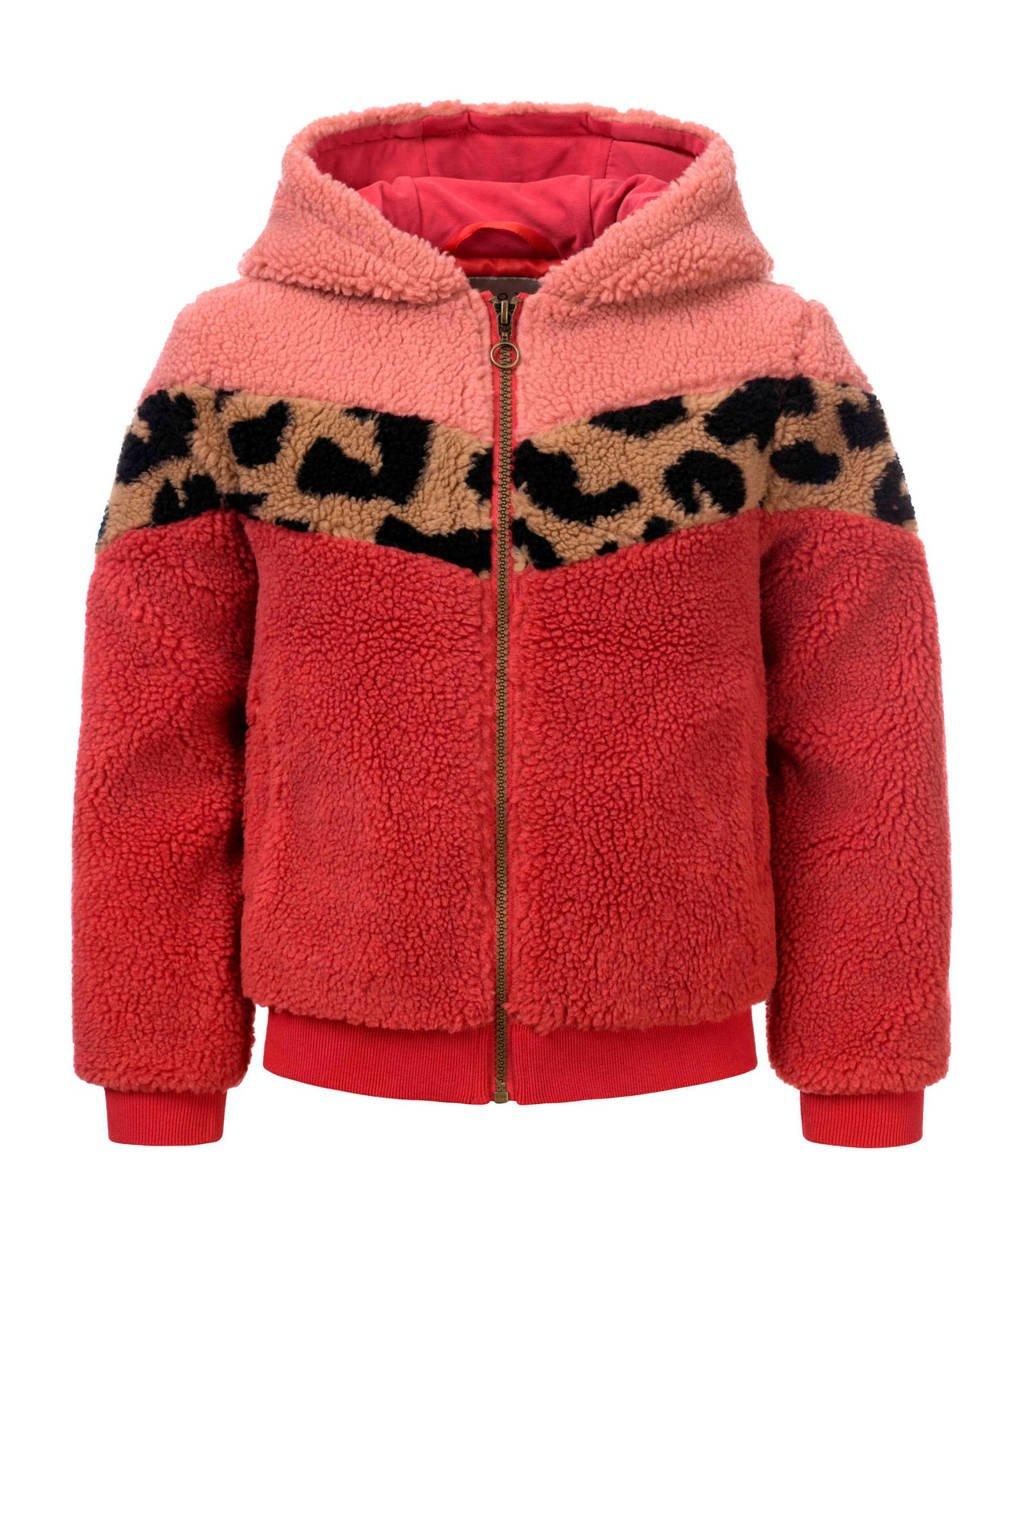 LOOXS little teddy winterjas fuchsia/roze/bruin, Fuchsia/roze/bruin